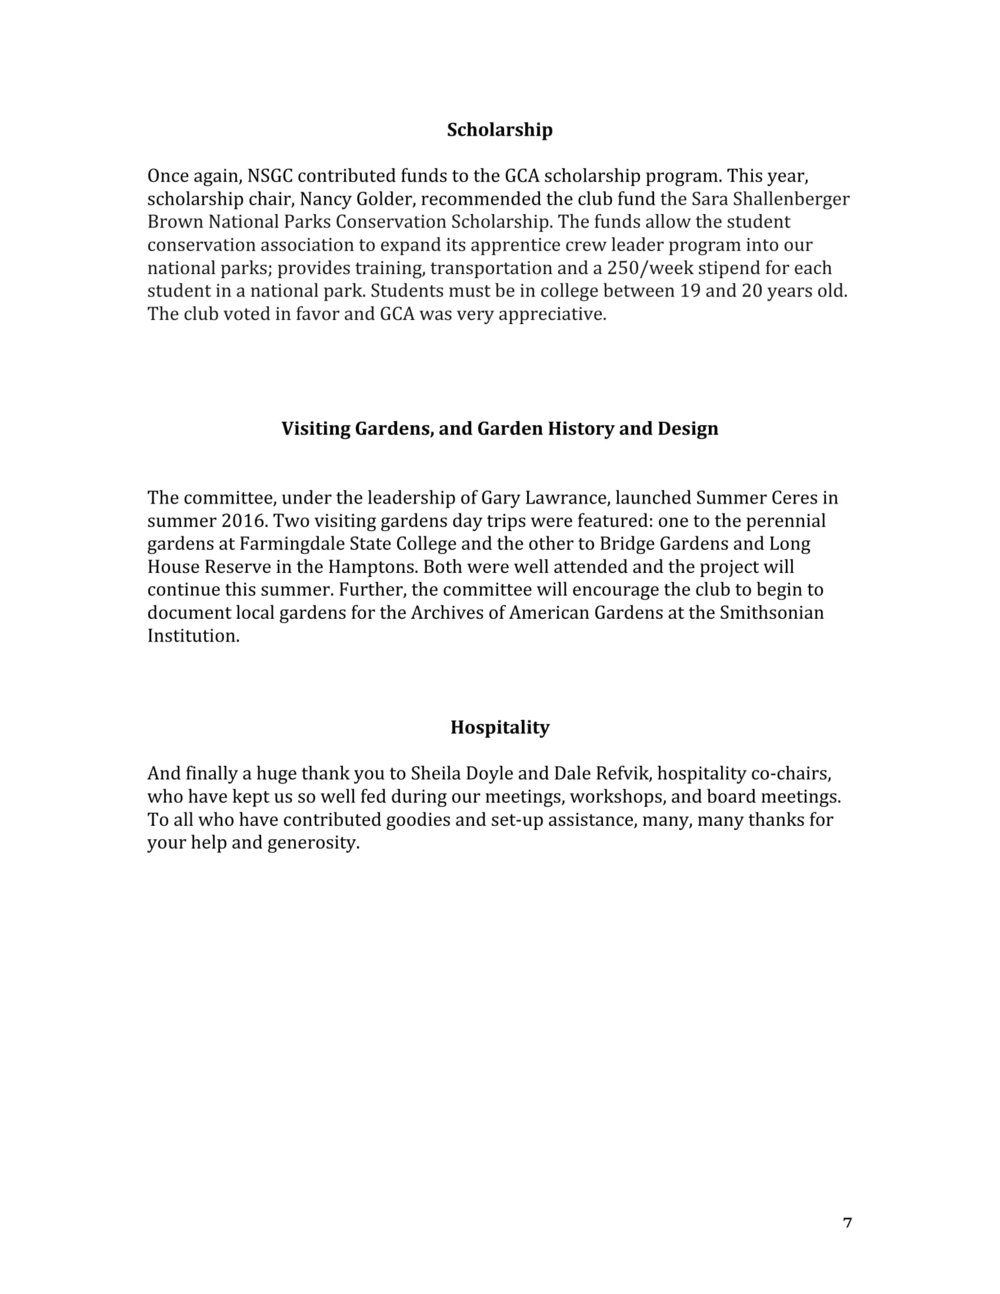 NSGC Annual Report-07.jpg